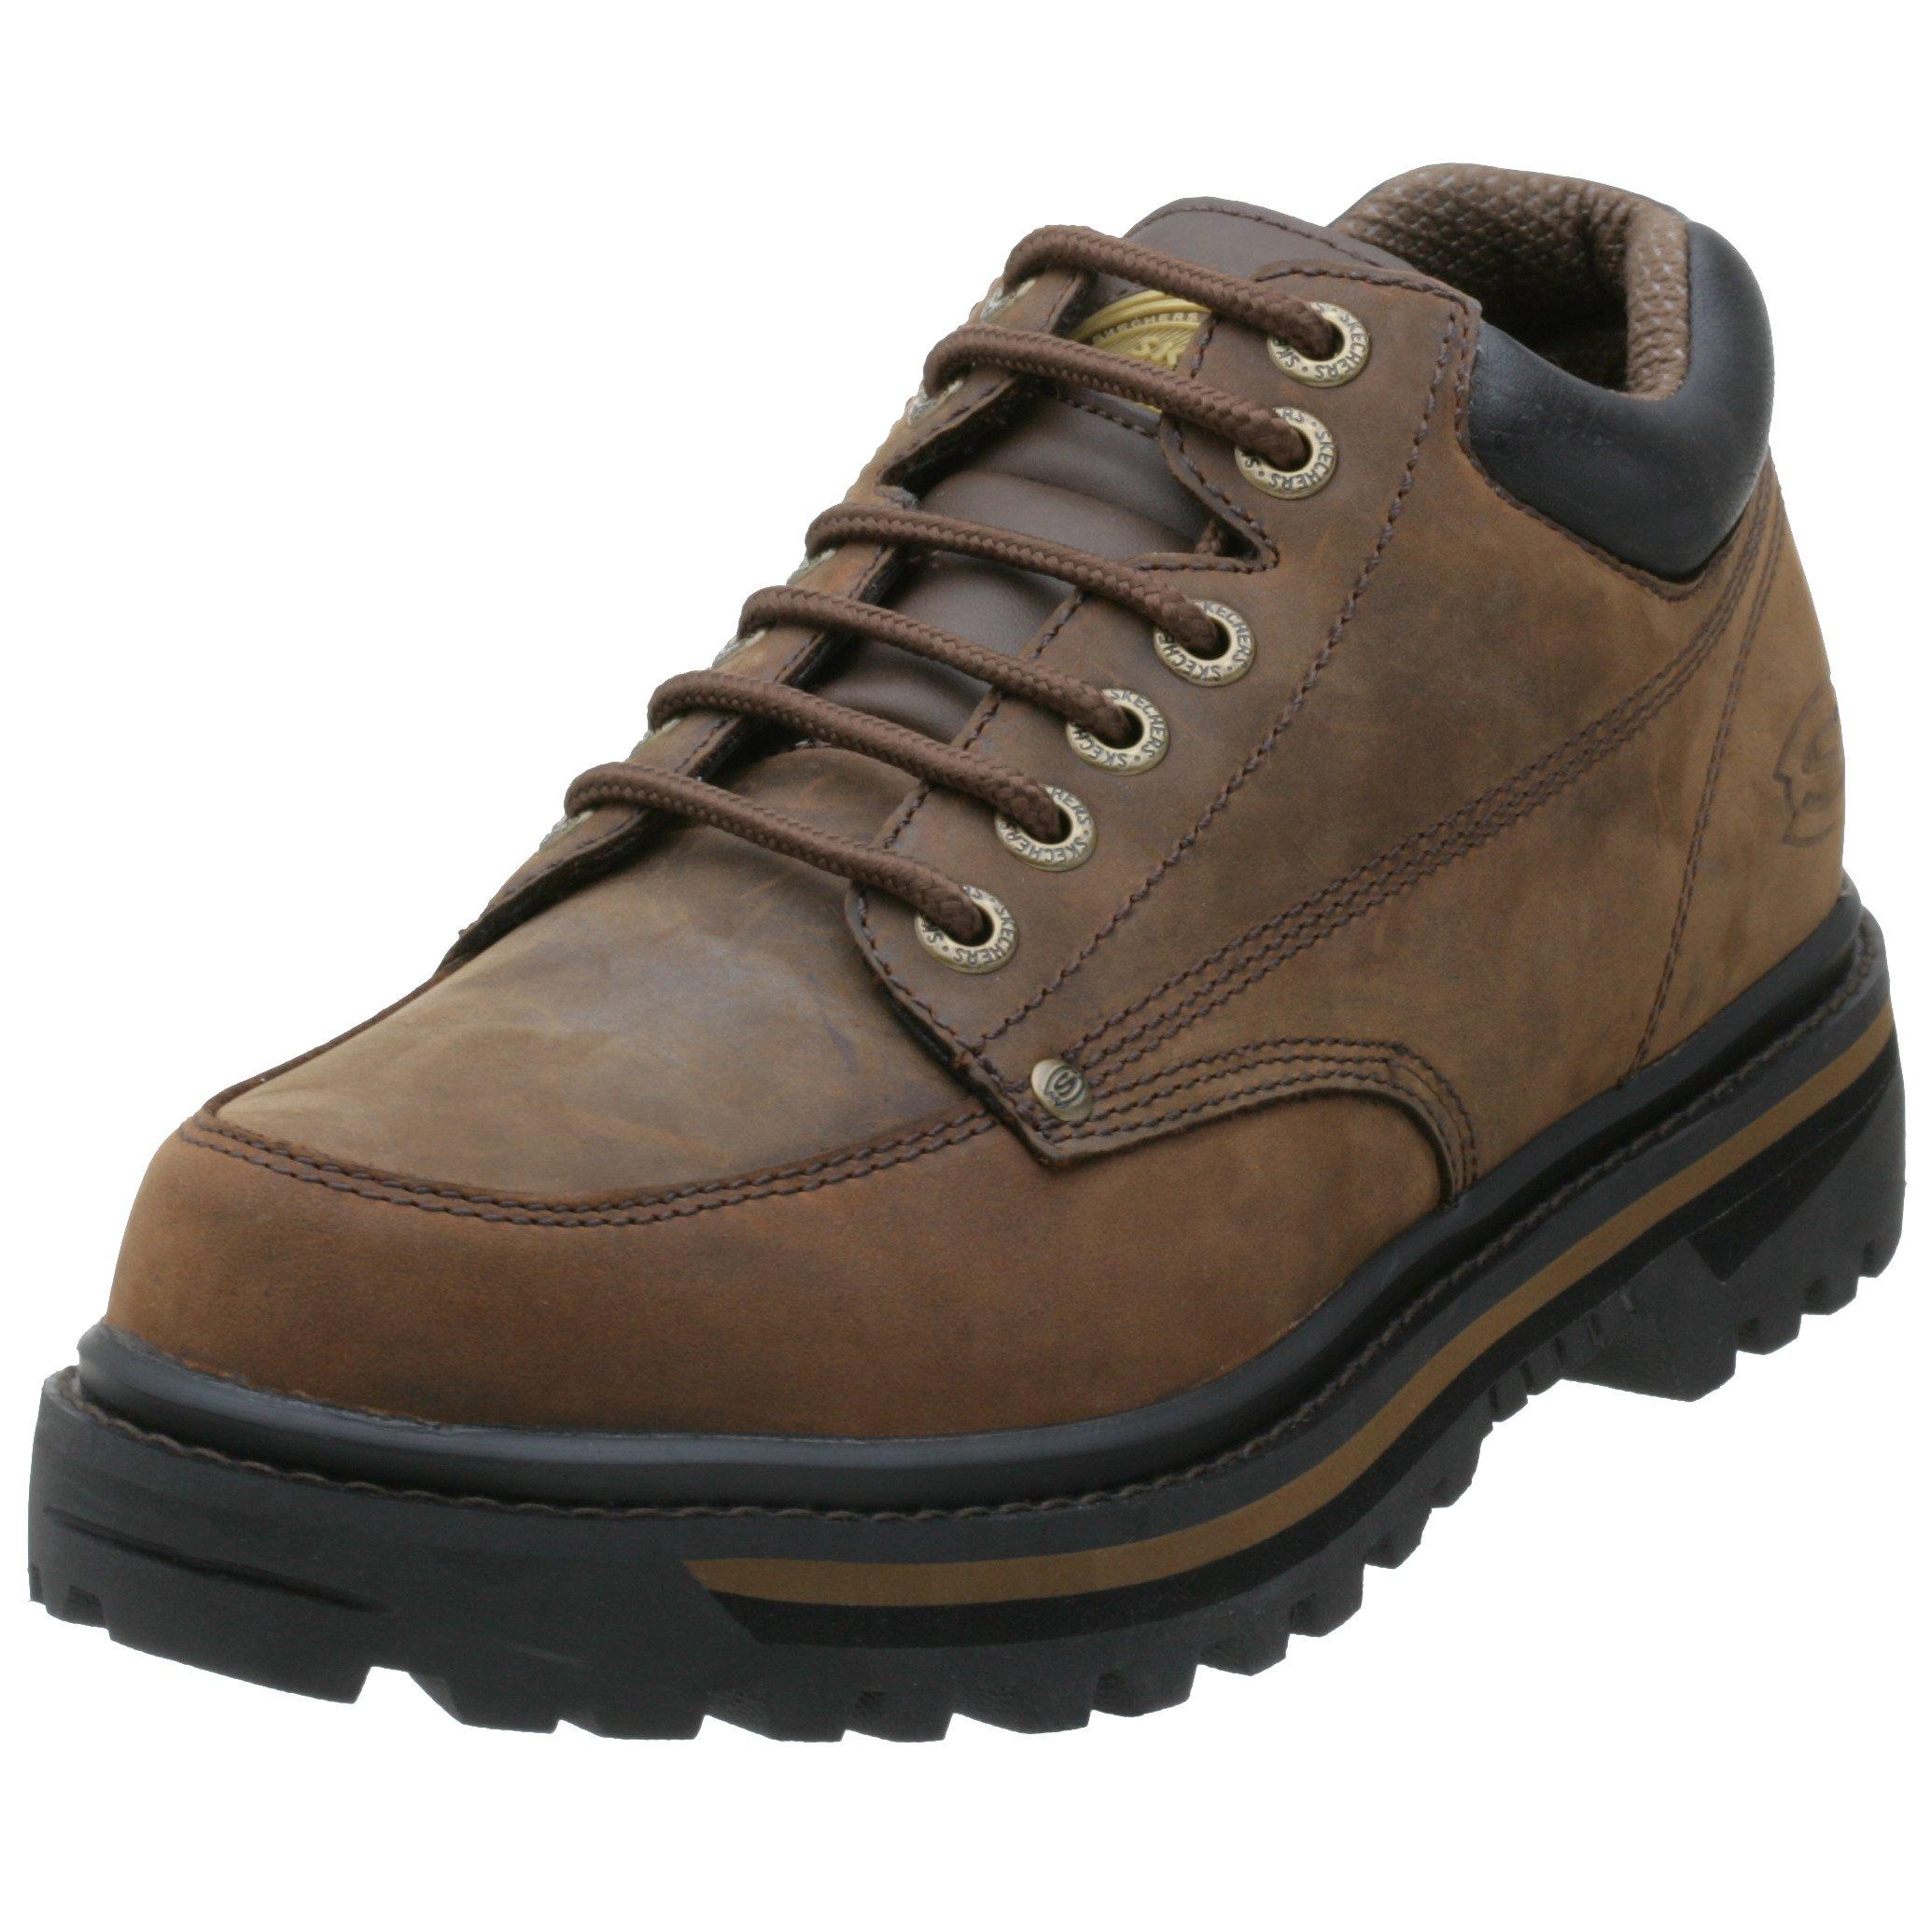 Skechers Men's Mariner Low Boot,Dark Brown,10.5 M US by Skechers